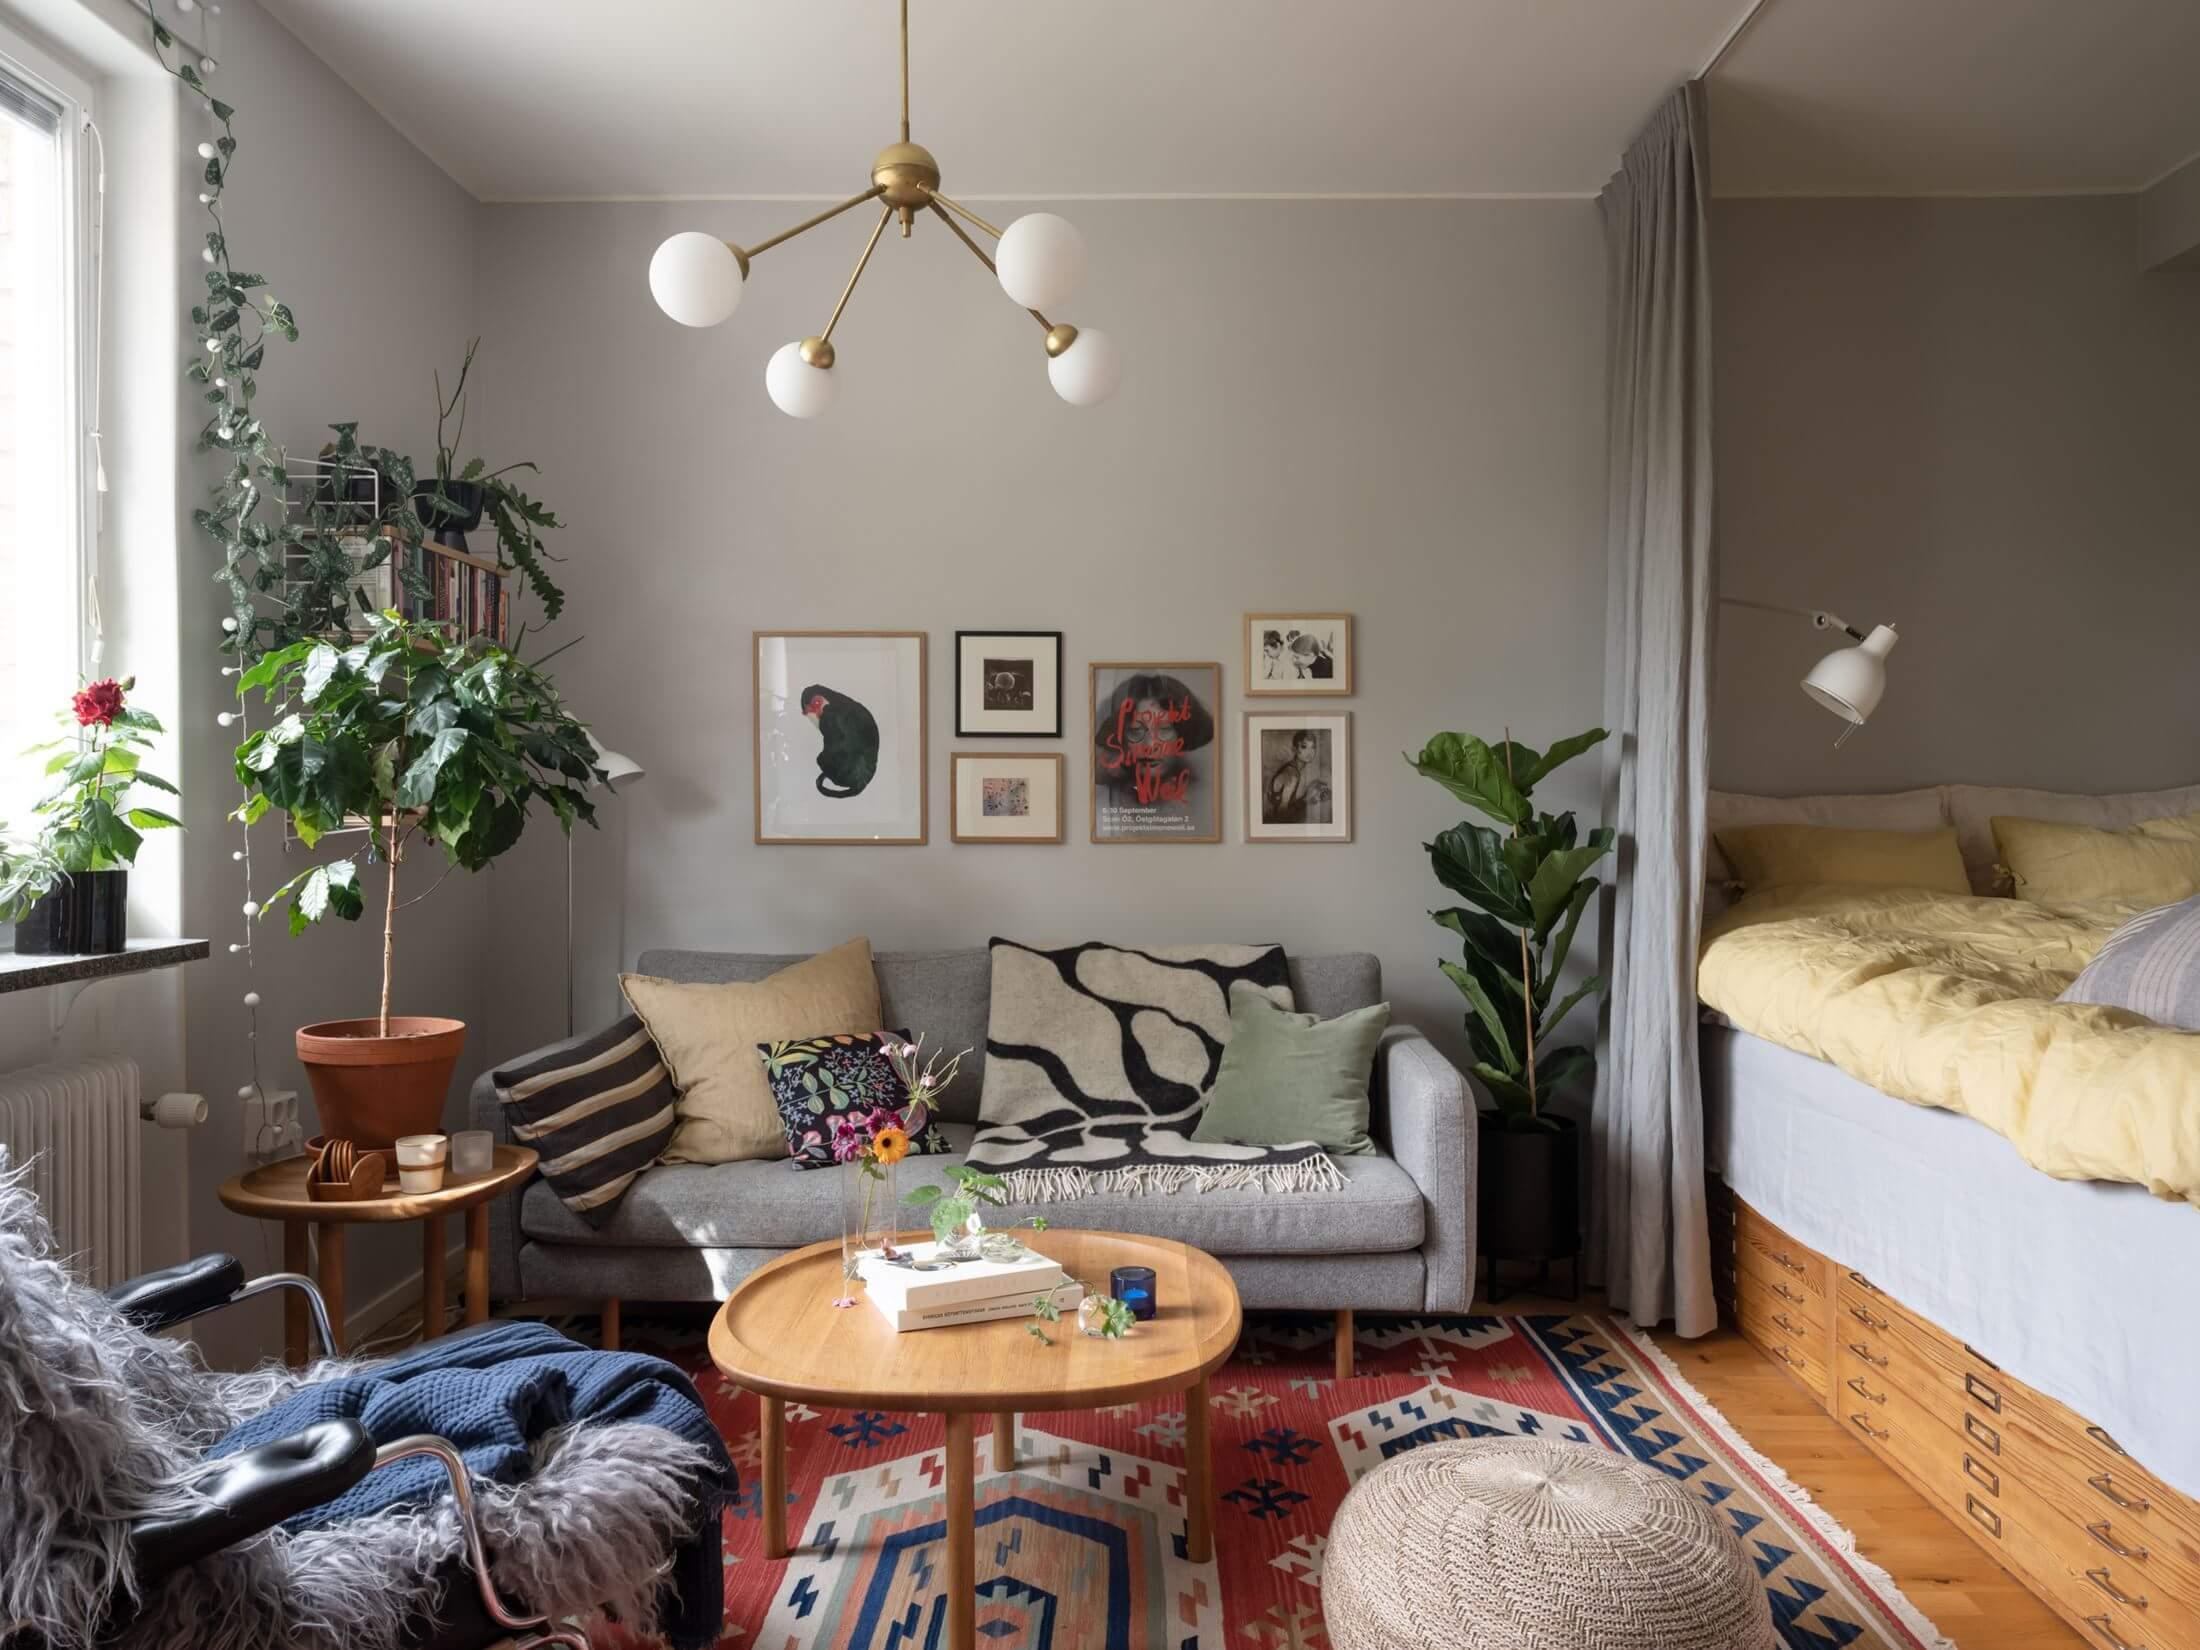 A Midcentury Studio Apartment in Sweden